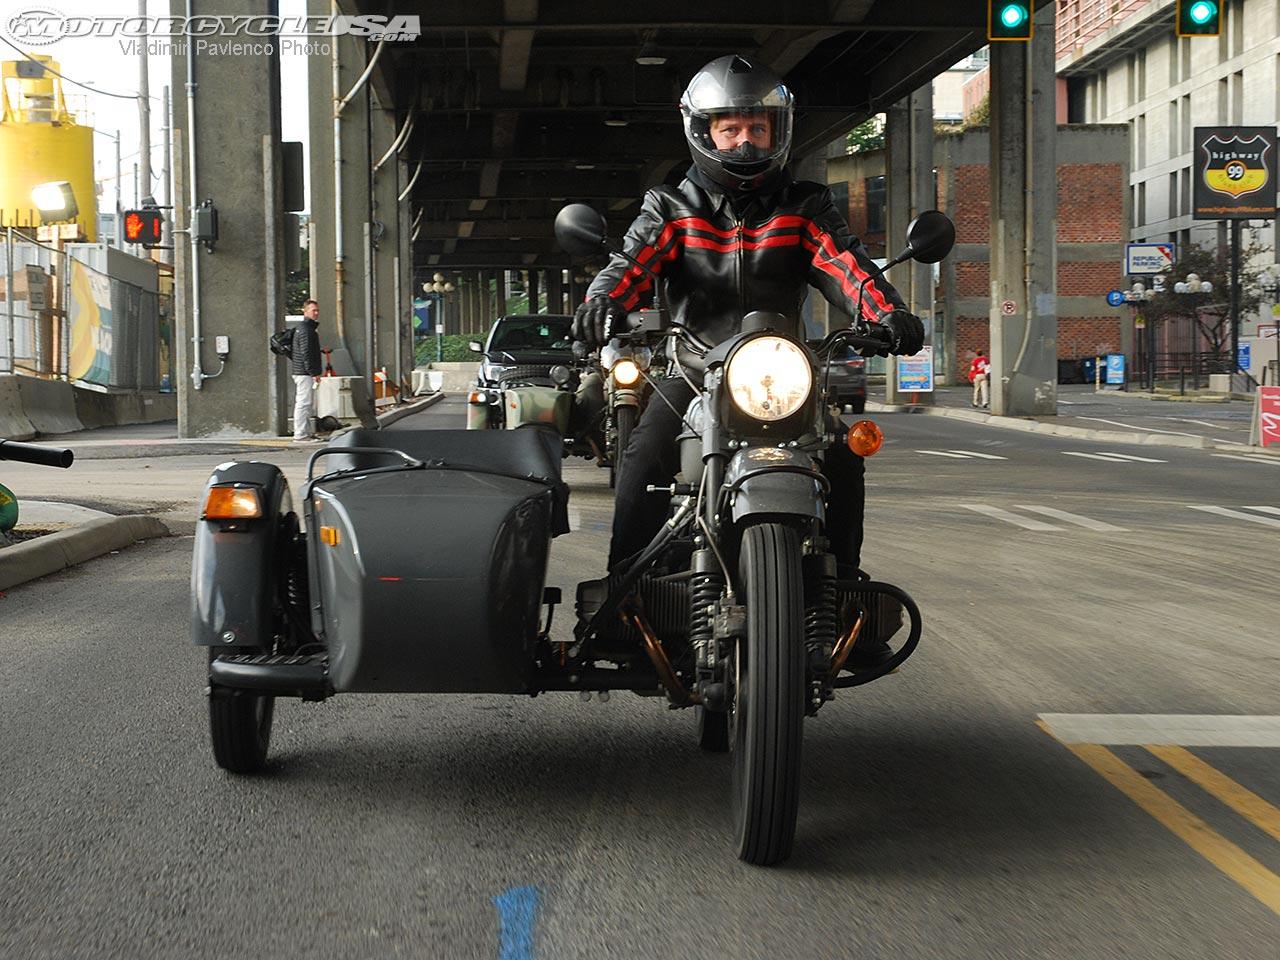 Review: 2015 Ural cT Sidecar Motorcycle on Countersteer